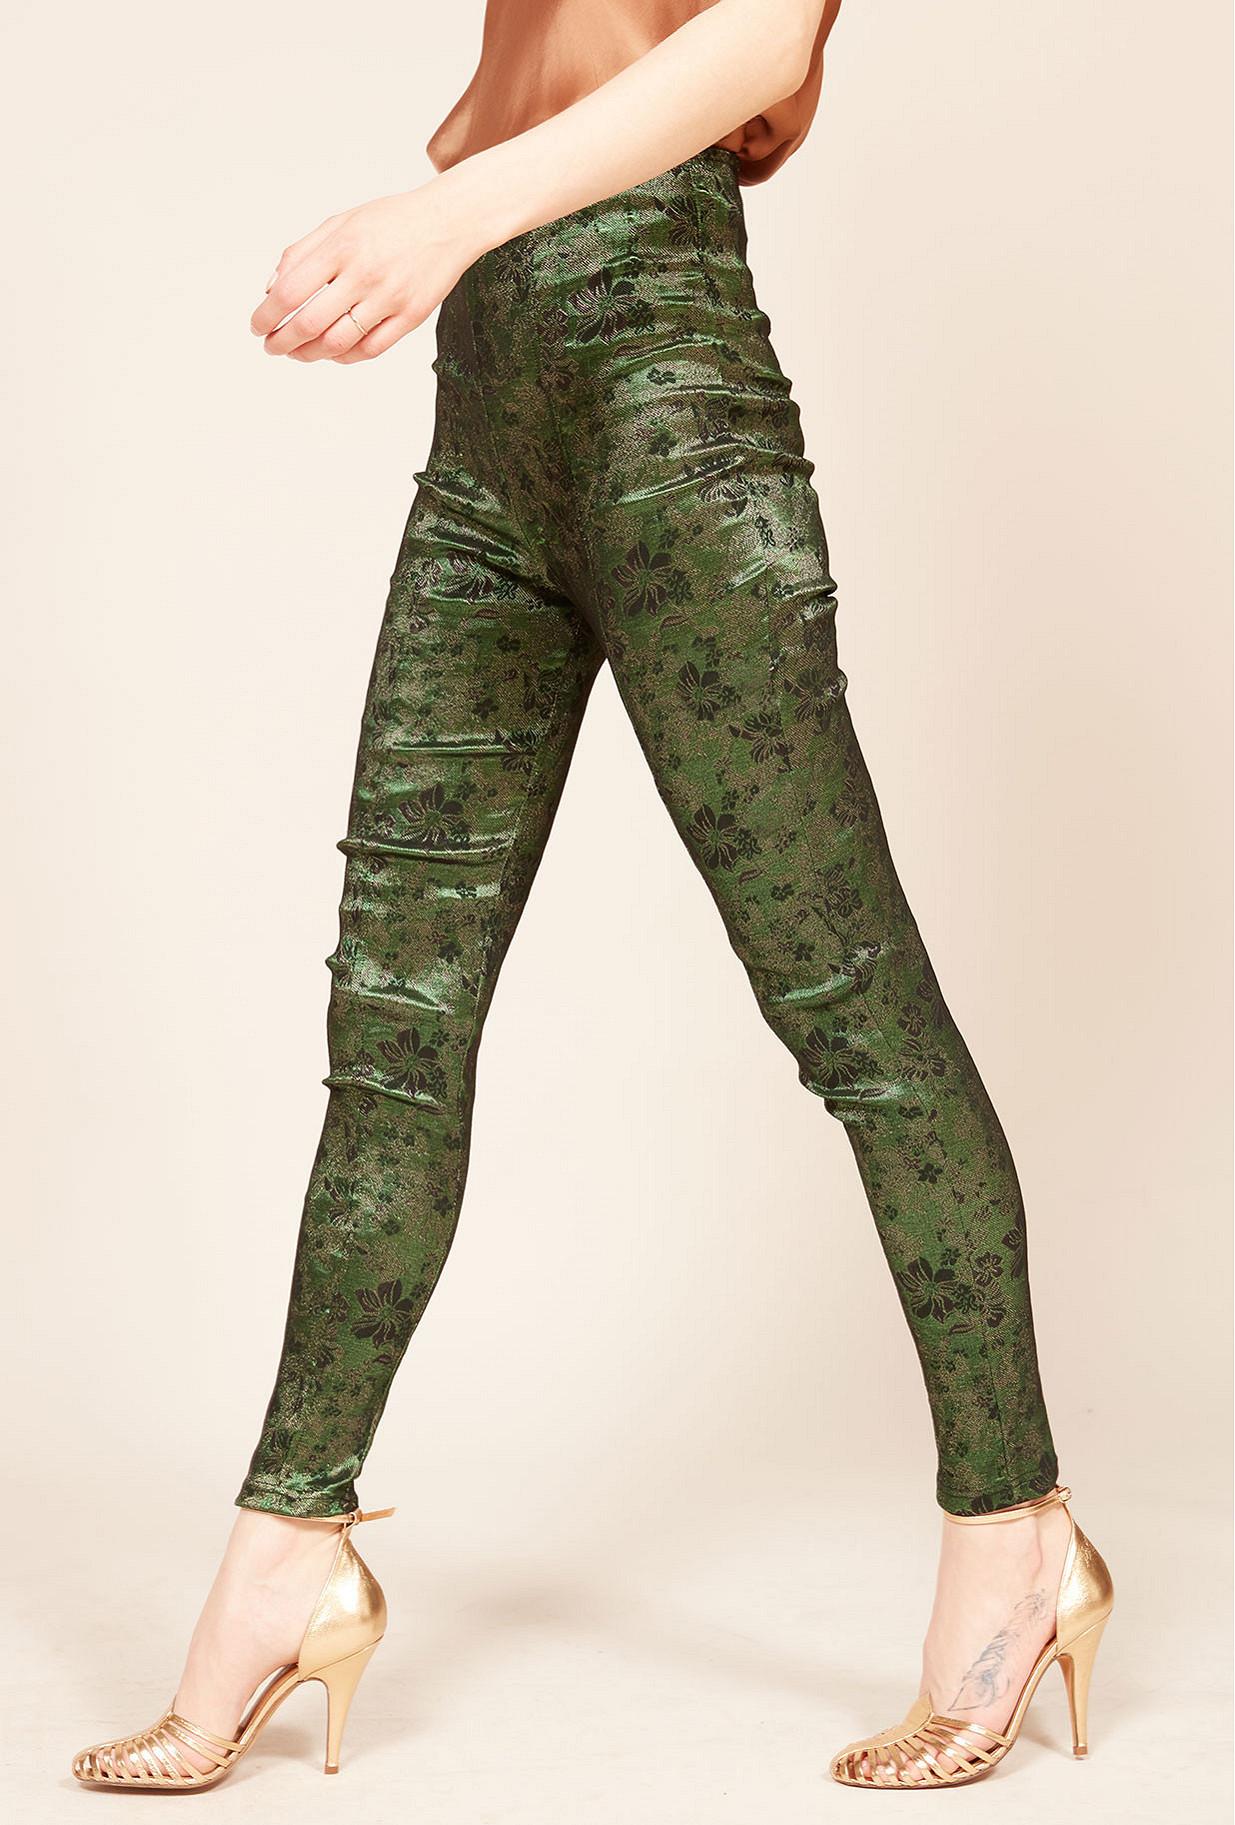 Print green  pant  Veronika Mes demoiselles fashion clothes designer Paris